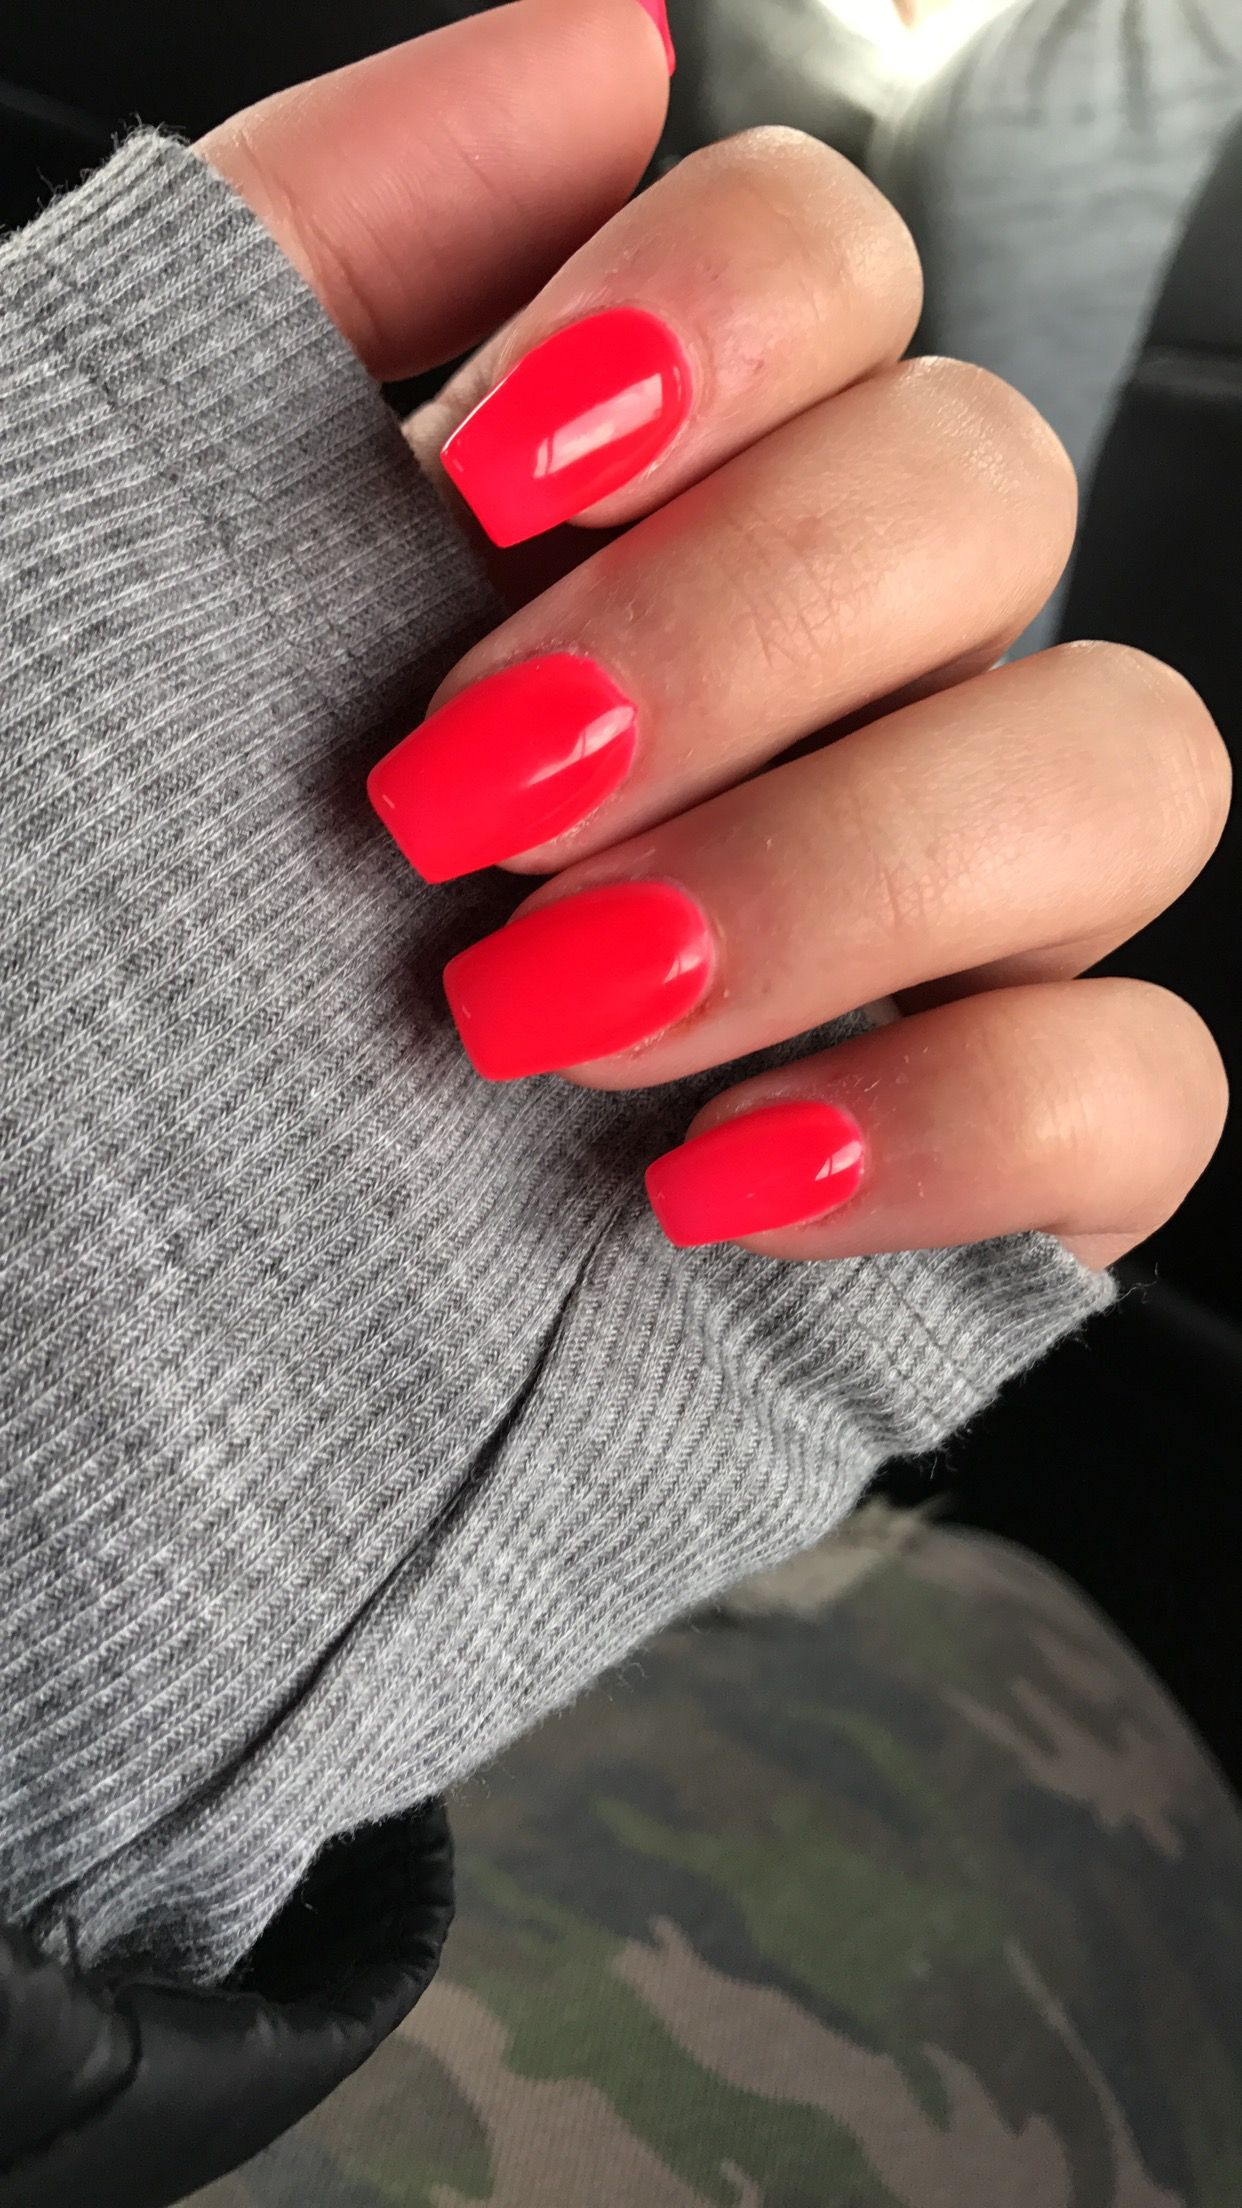 Short Coffin Acrylic Nails With Shellac Polish Summernails Red Acrylic Nails Red Nails Acrylic Nails